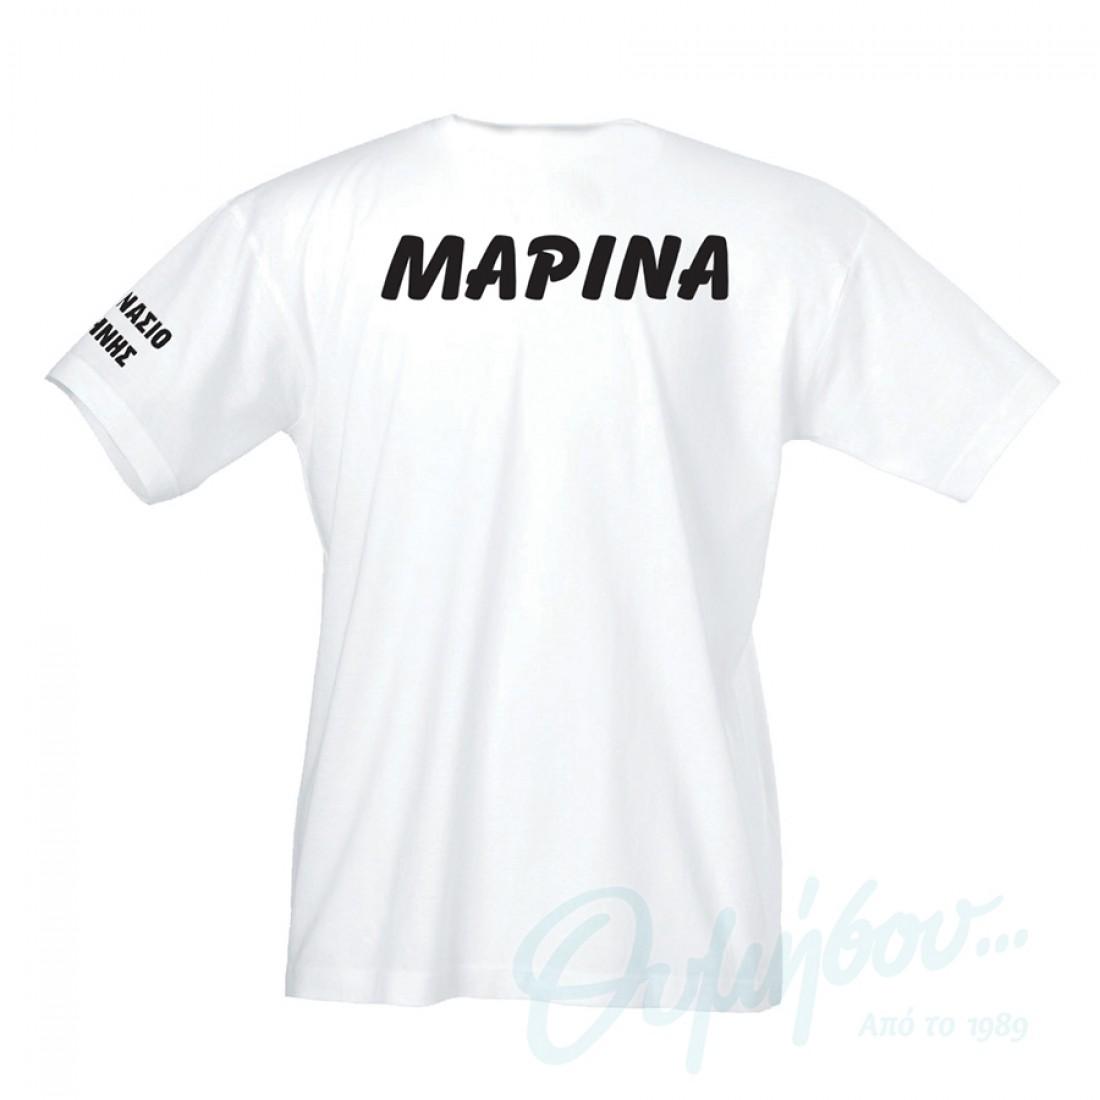 bcf6fc036a6a Λευκό μπλουζάκι με ψηφιακή εκτύπωση thimisou.gr